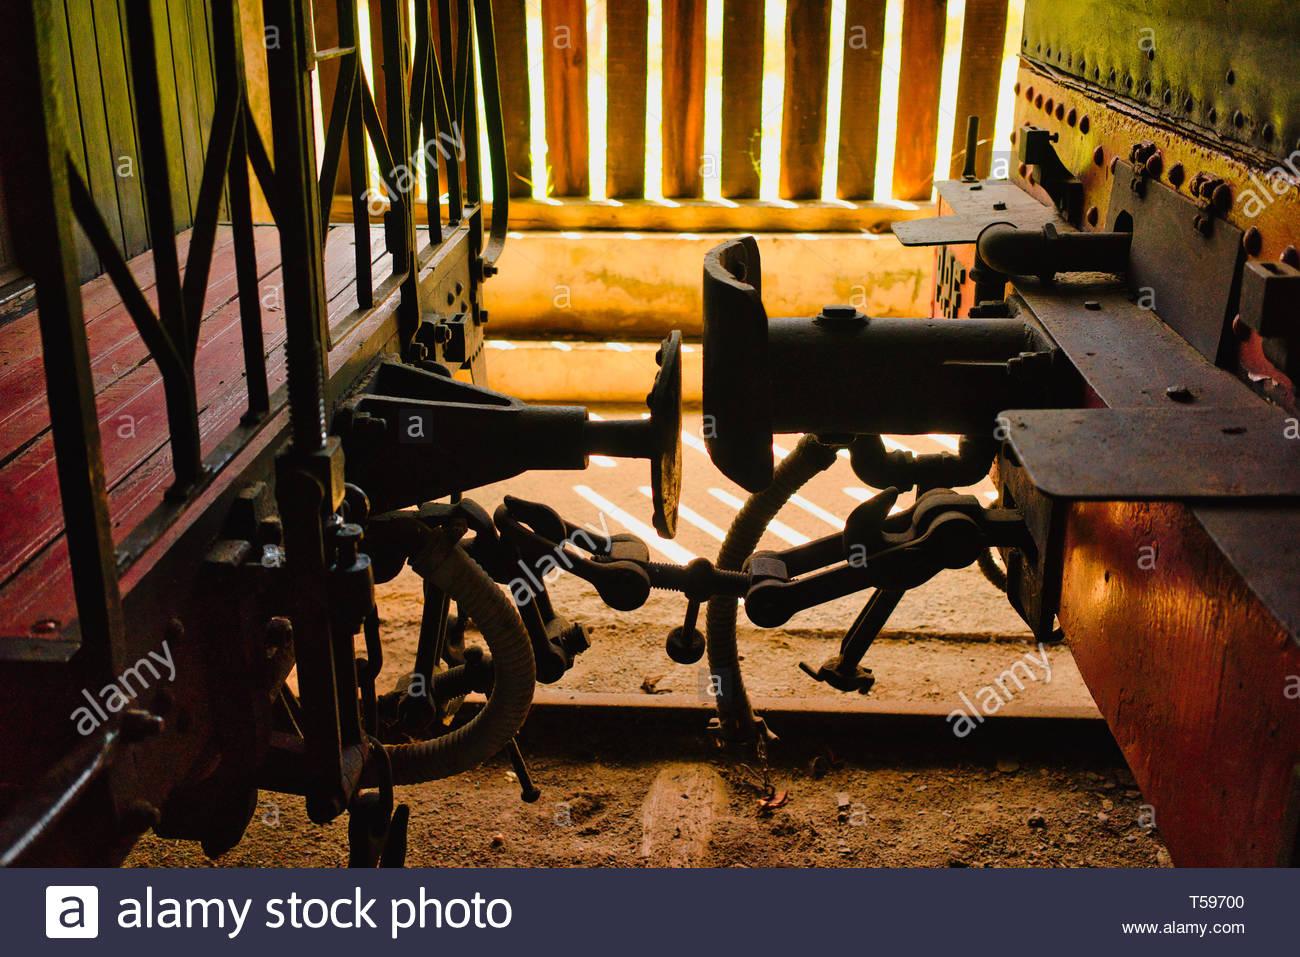 railway wagon buffers - Stock Image